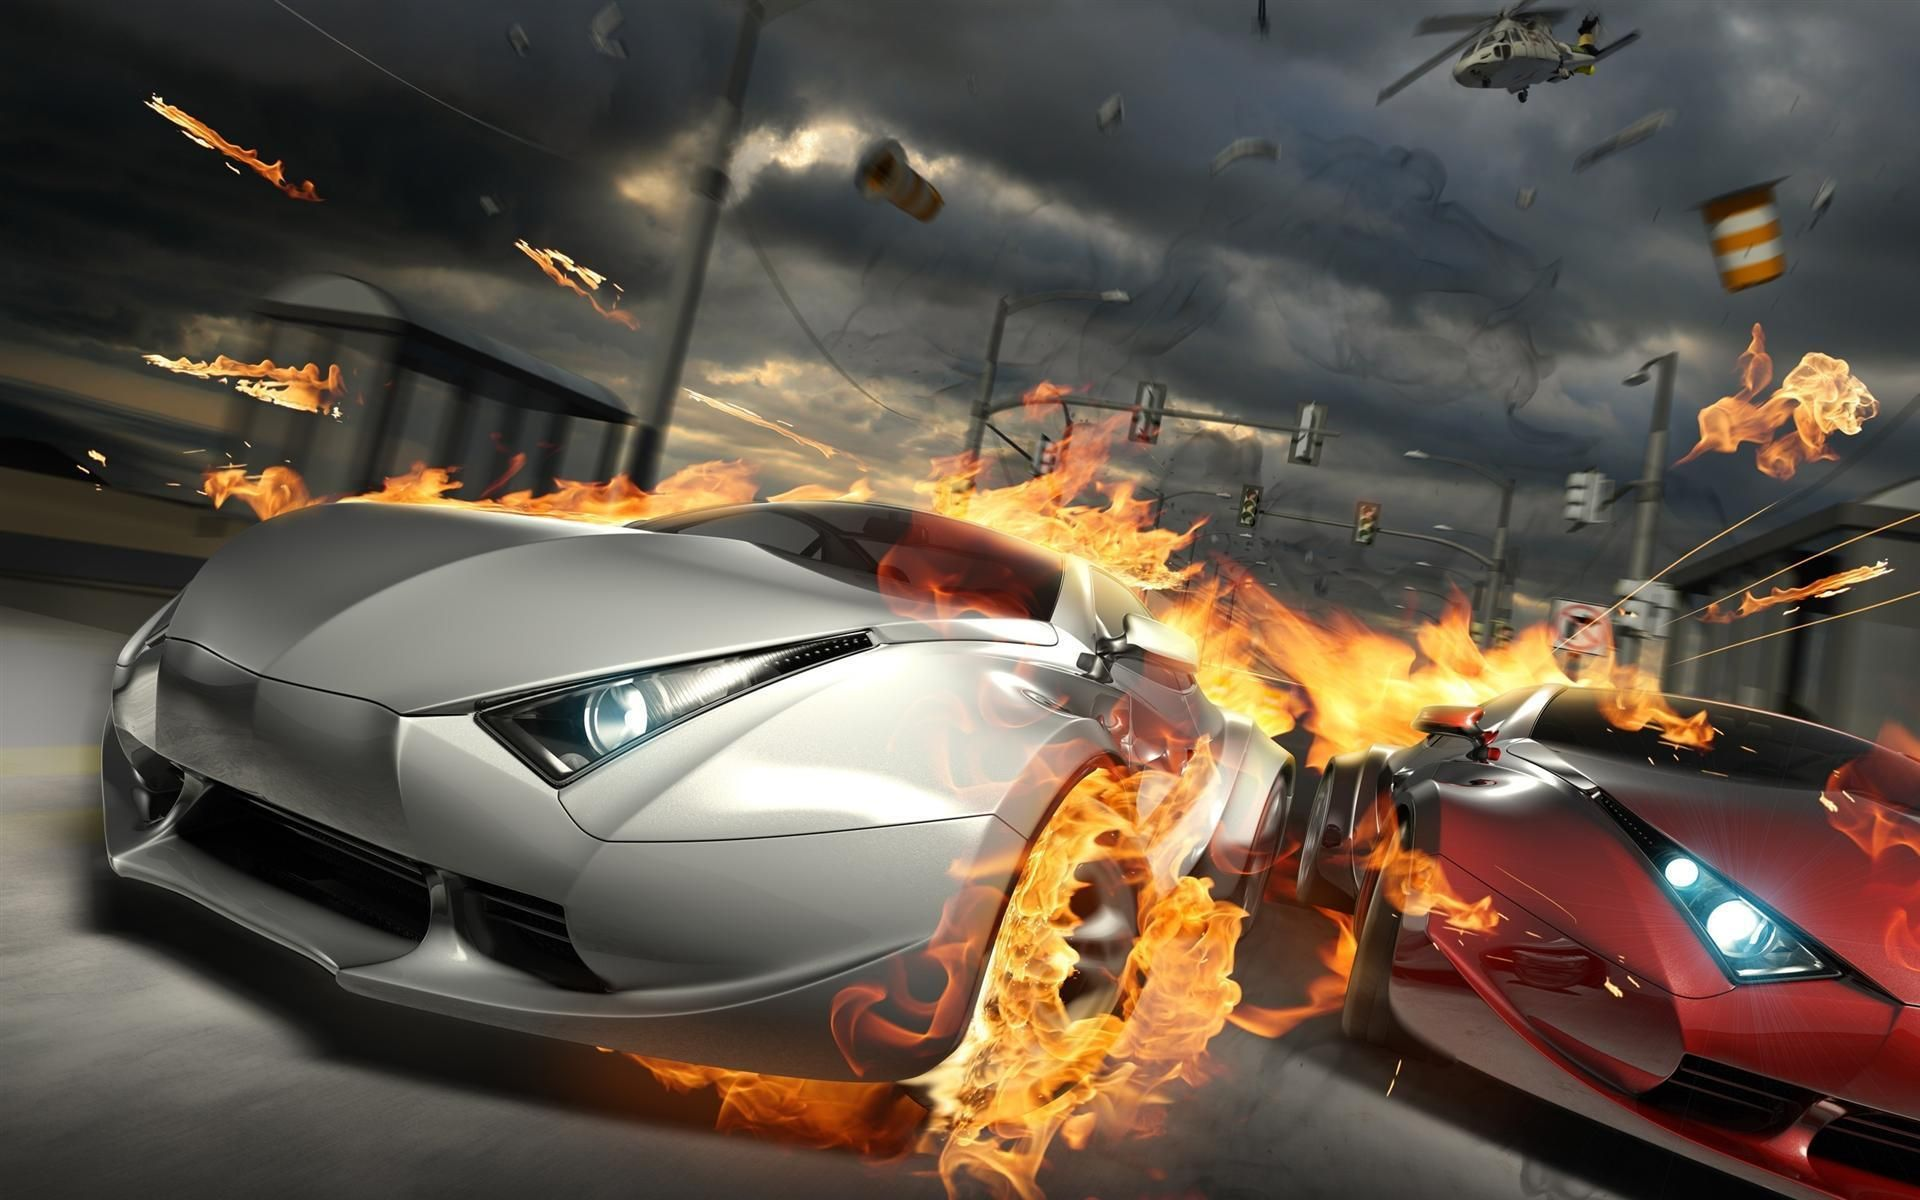 wallpaper fire cars cars hd wallpaper 1920x1200 px   wallpaper